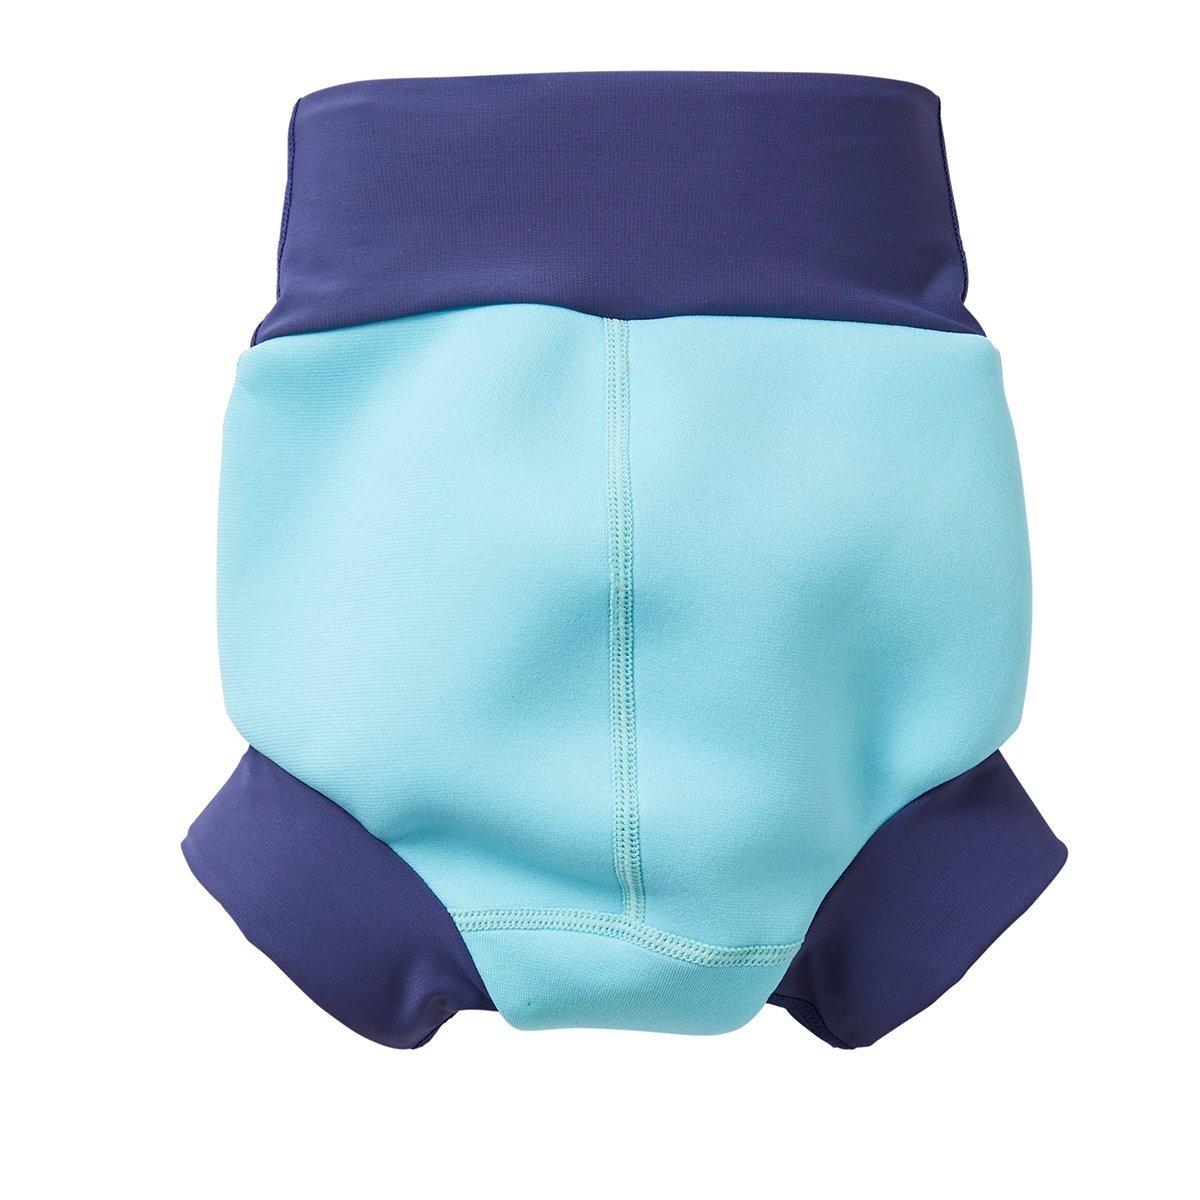 Splash-About-Happy-Nappy-Baby-amp-Toddler-Swimwear-Nappy-and-Shorts-Sun-Safe thumbnail 7